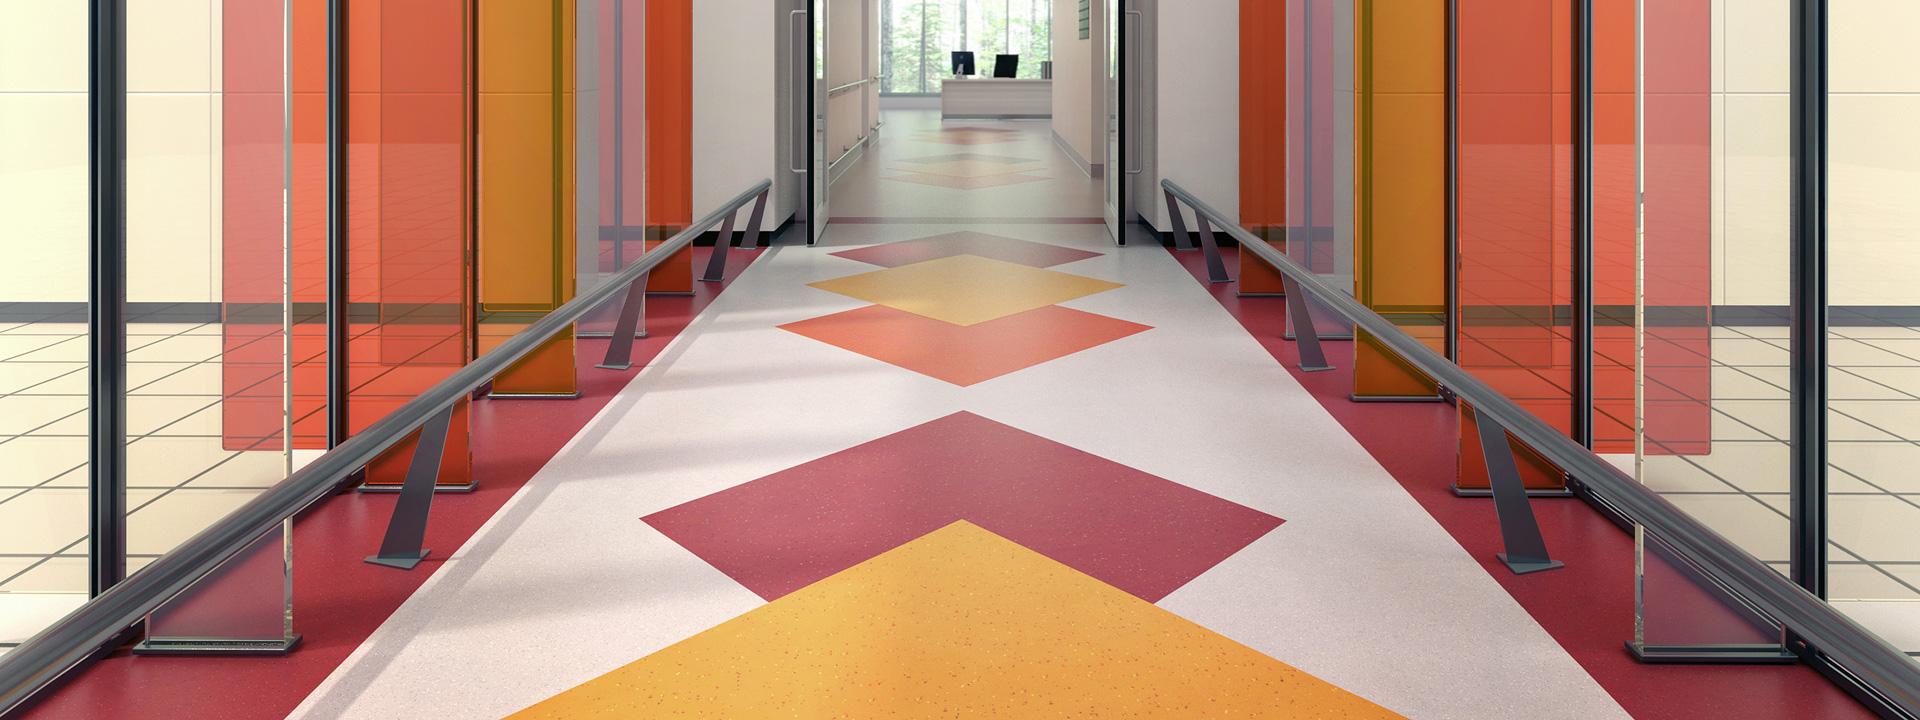 American Biltrite Flooring<?php/*echo $banner['image_alt'];*/?>